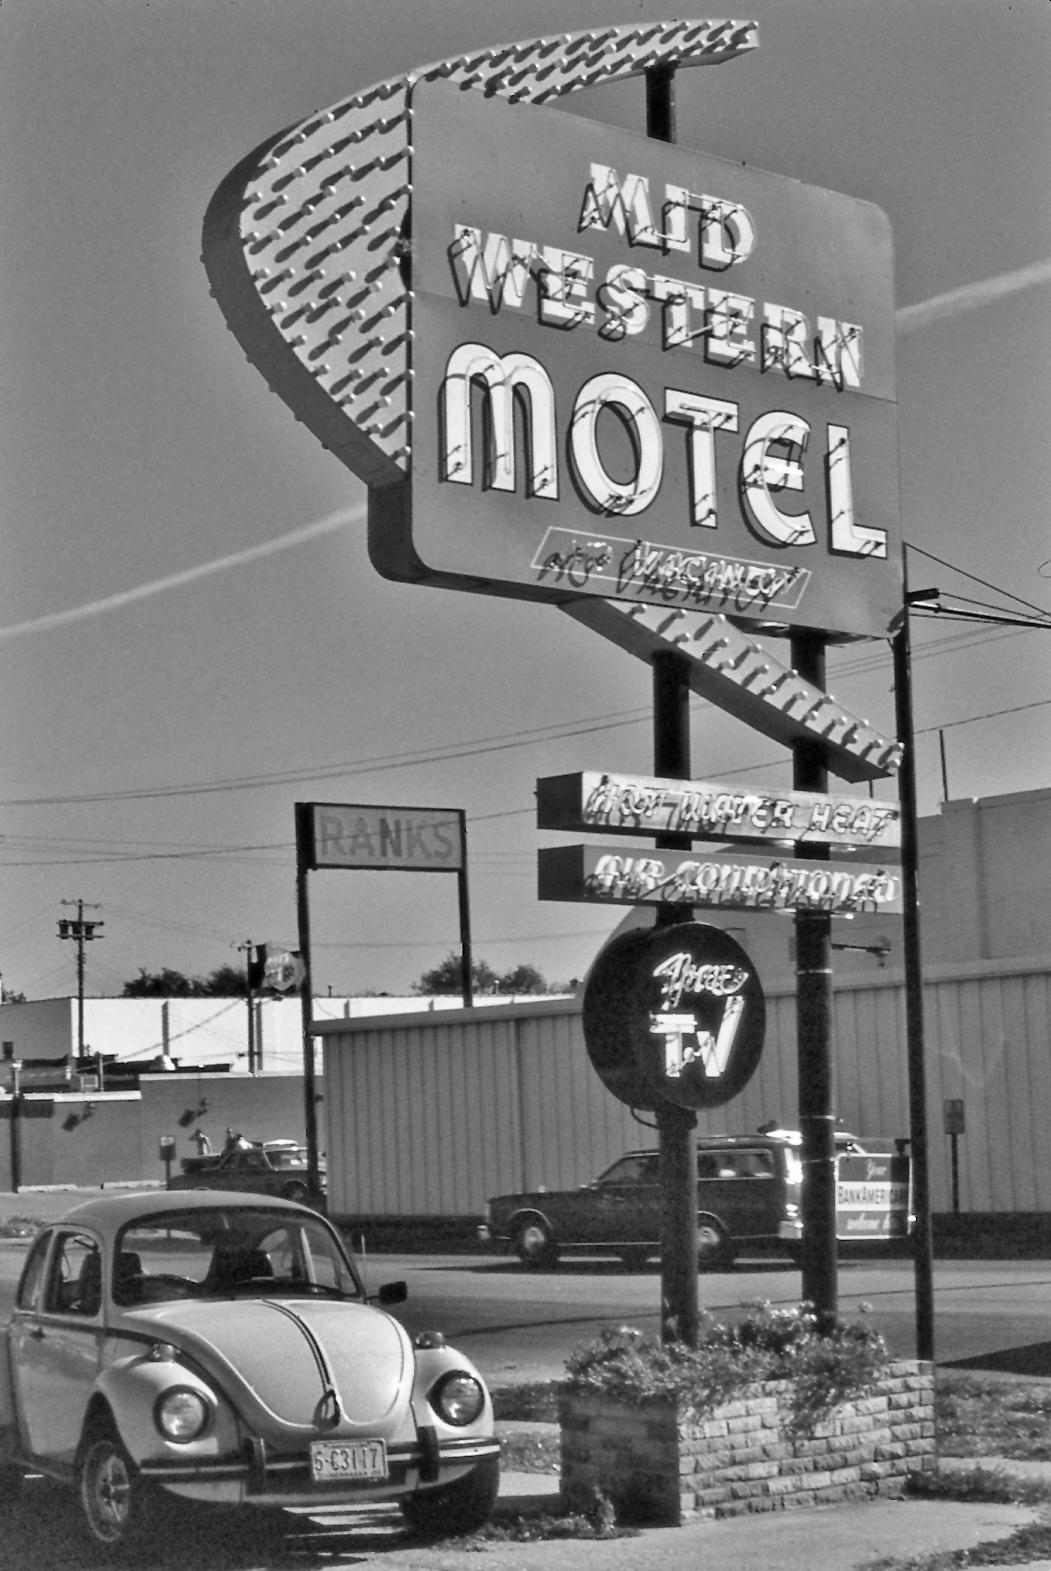 Midwestern Motel, photograph, 1 - jannelson | ello